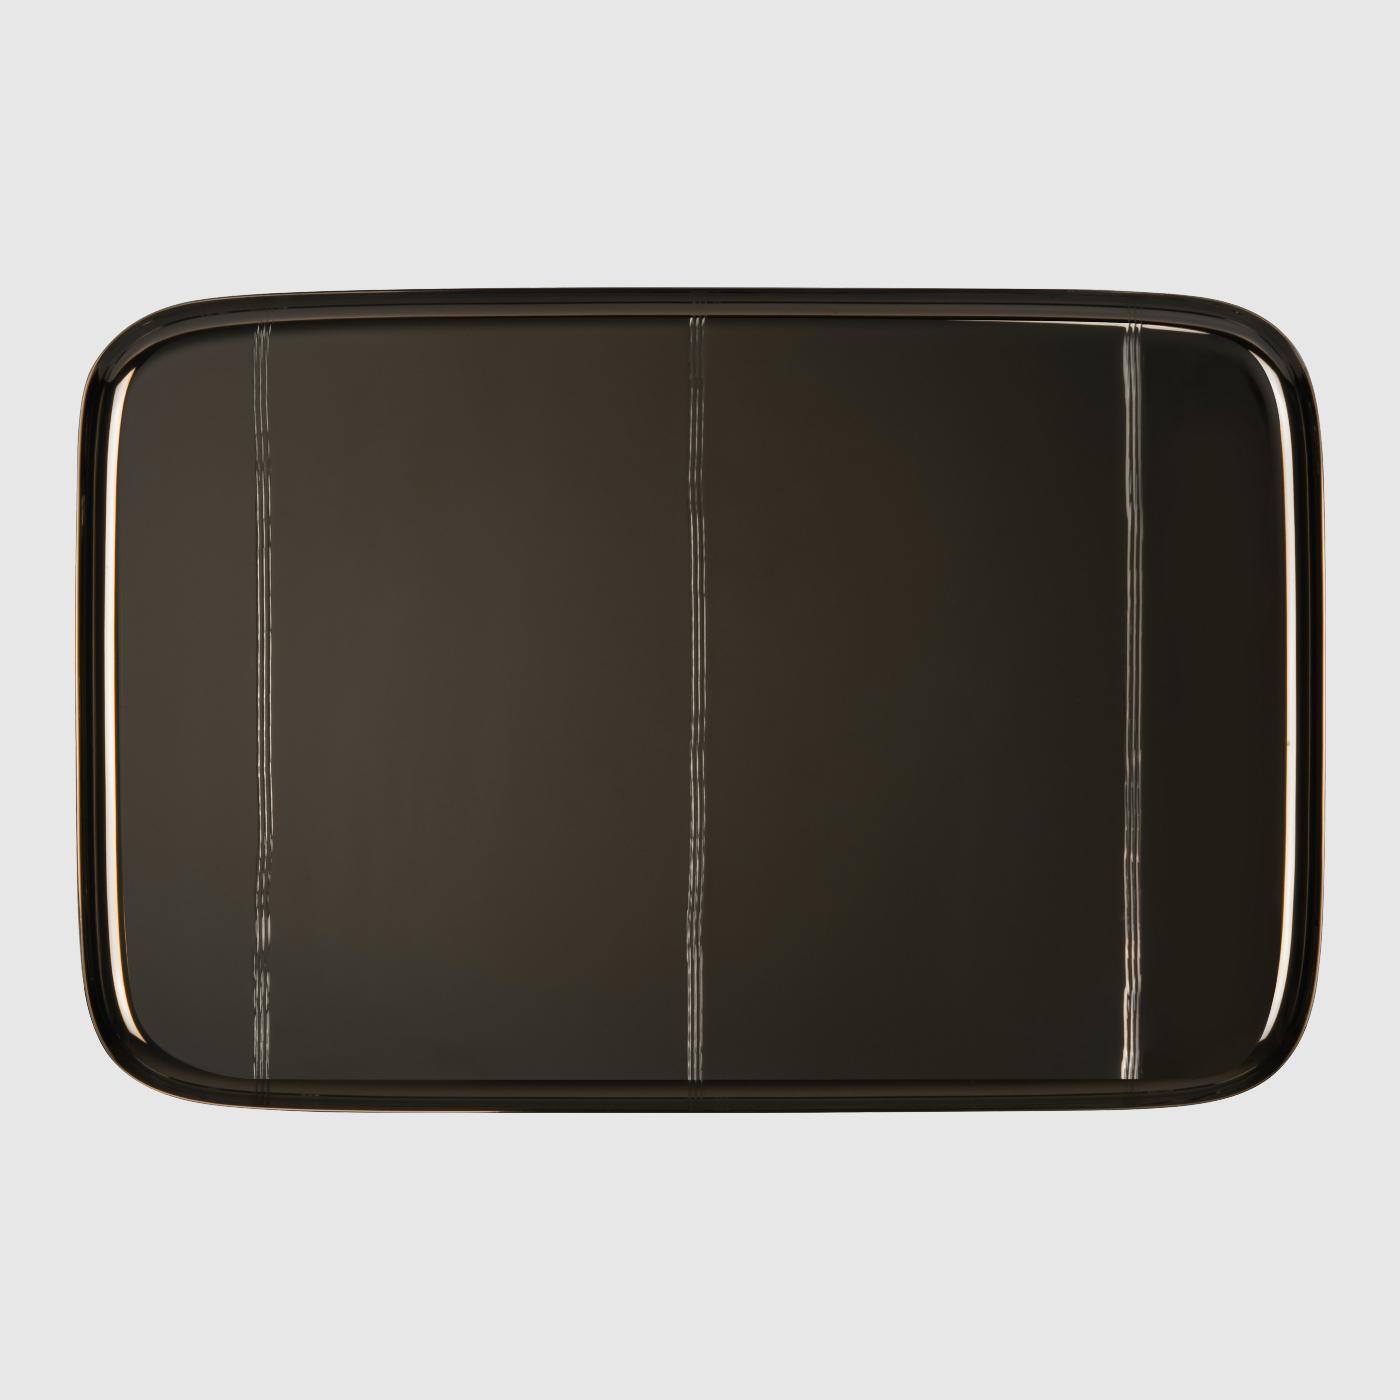 modern-tray-gioi-barock-2